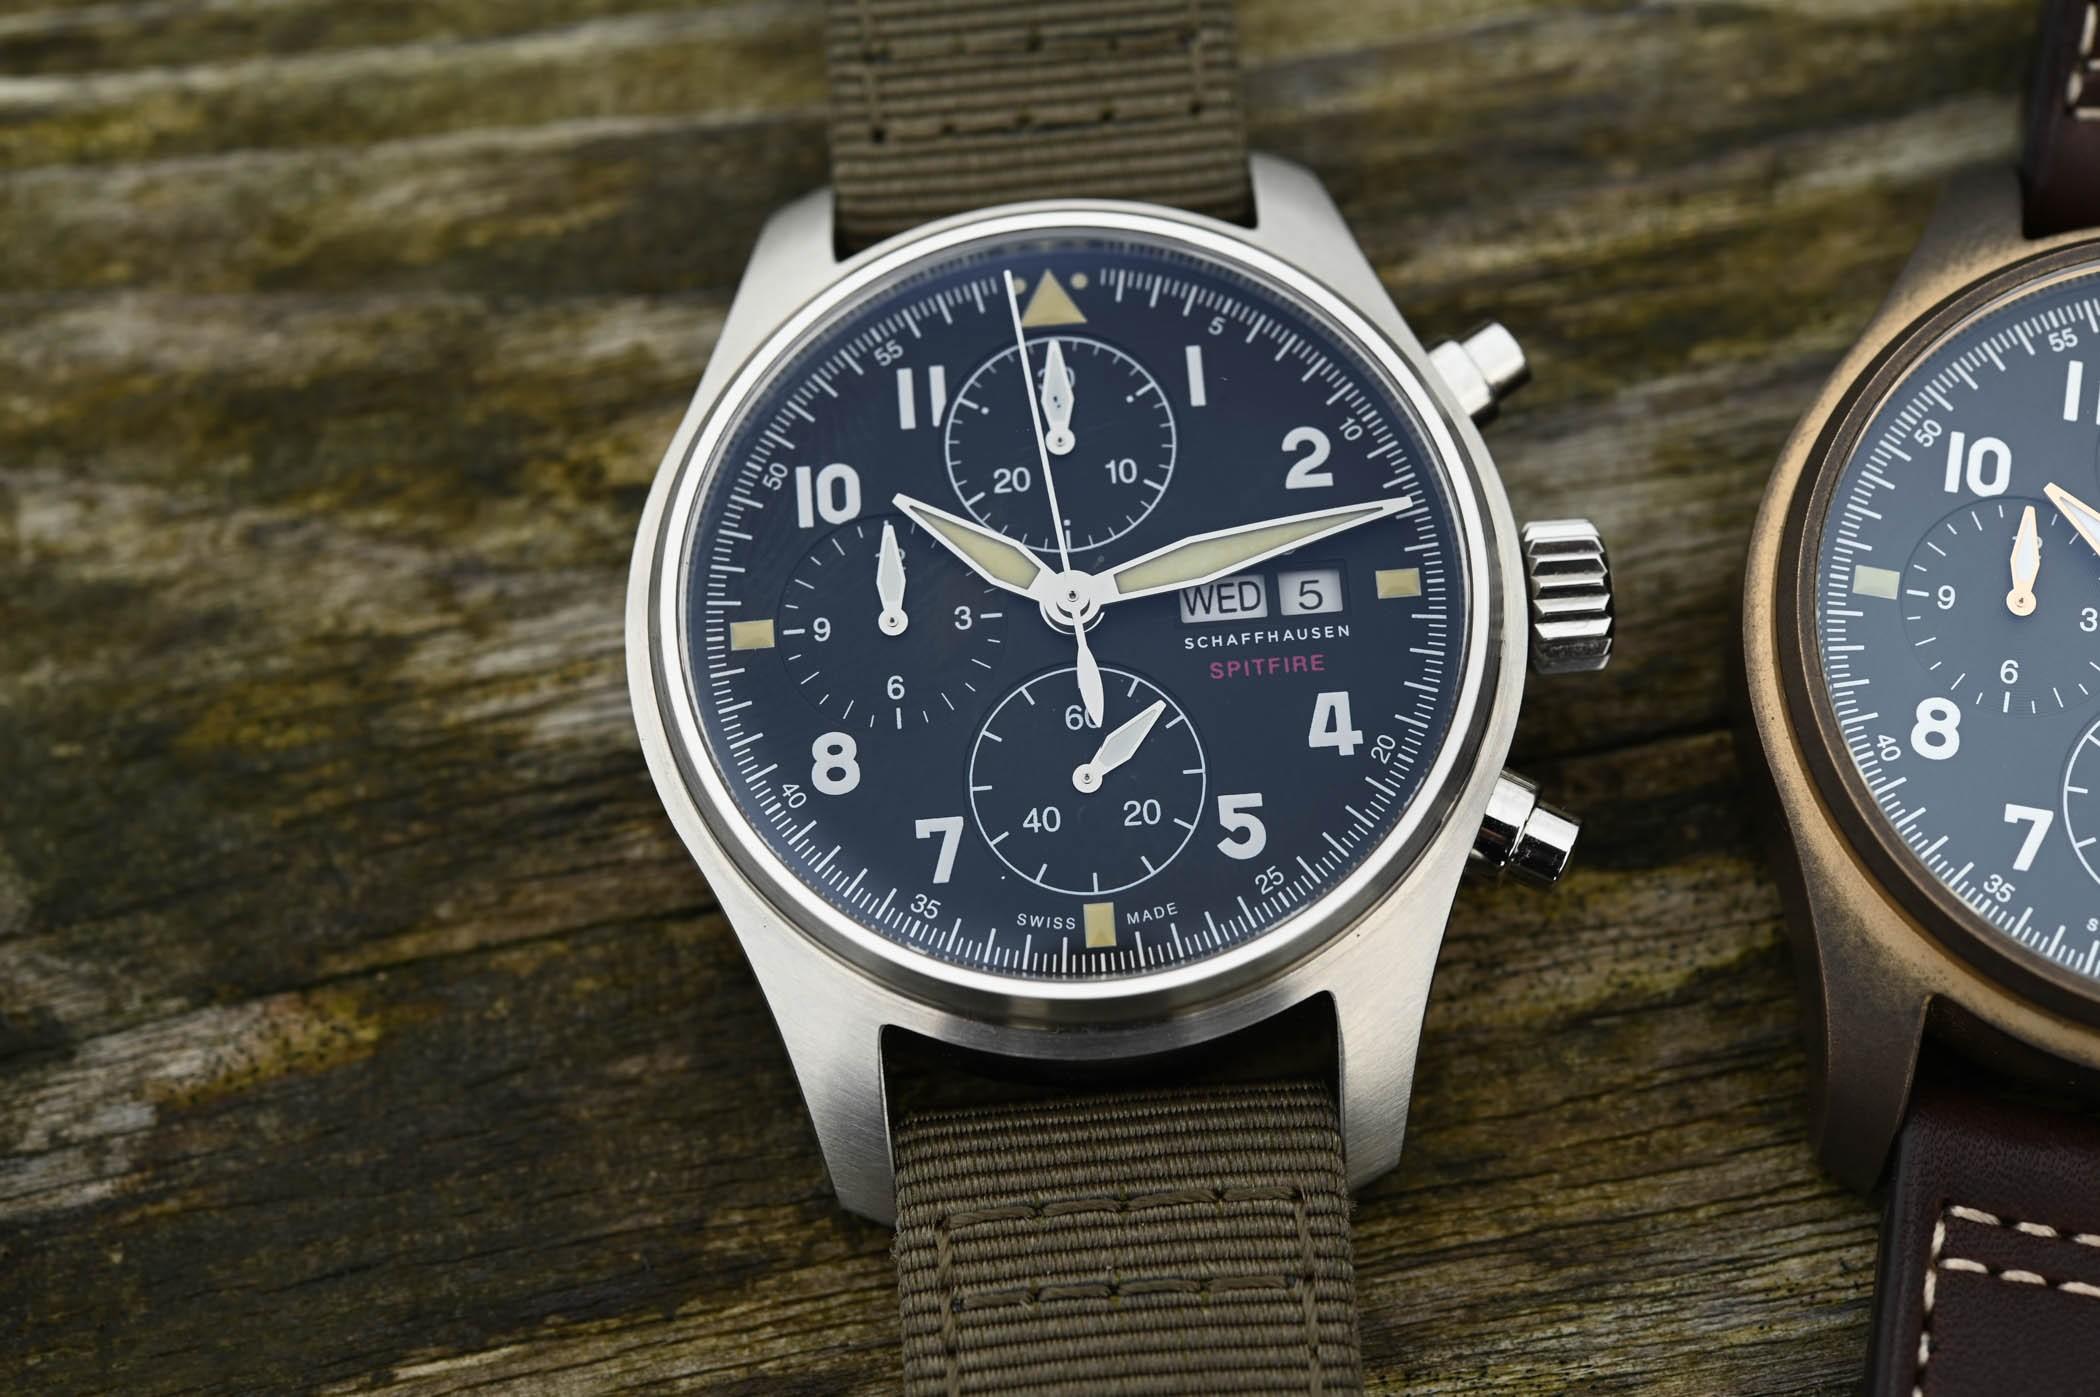 IWC Pilot s Watch Chronograph Spitfire Steel 41mm IW SIHH